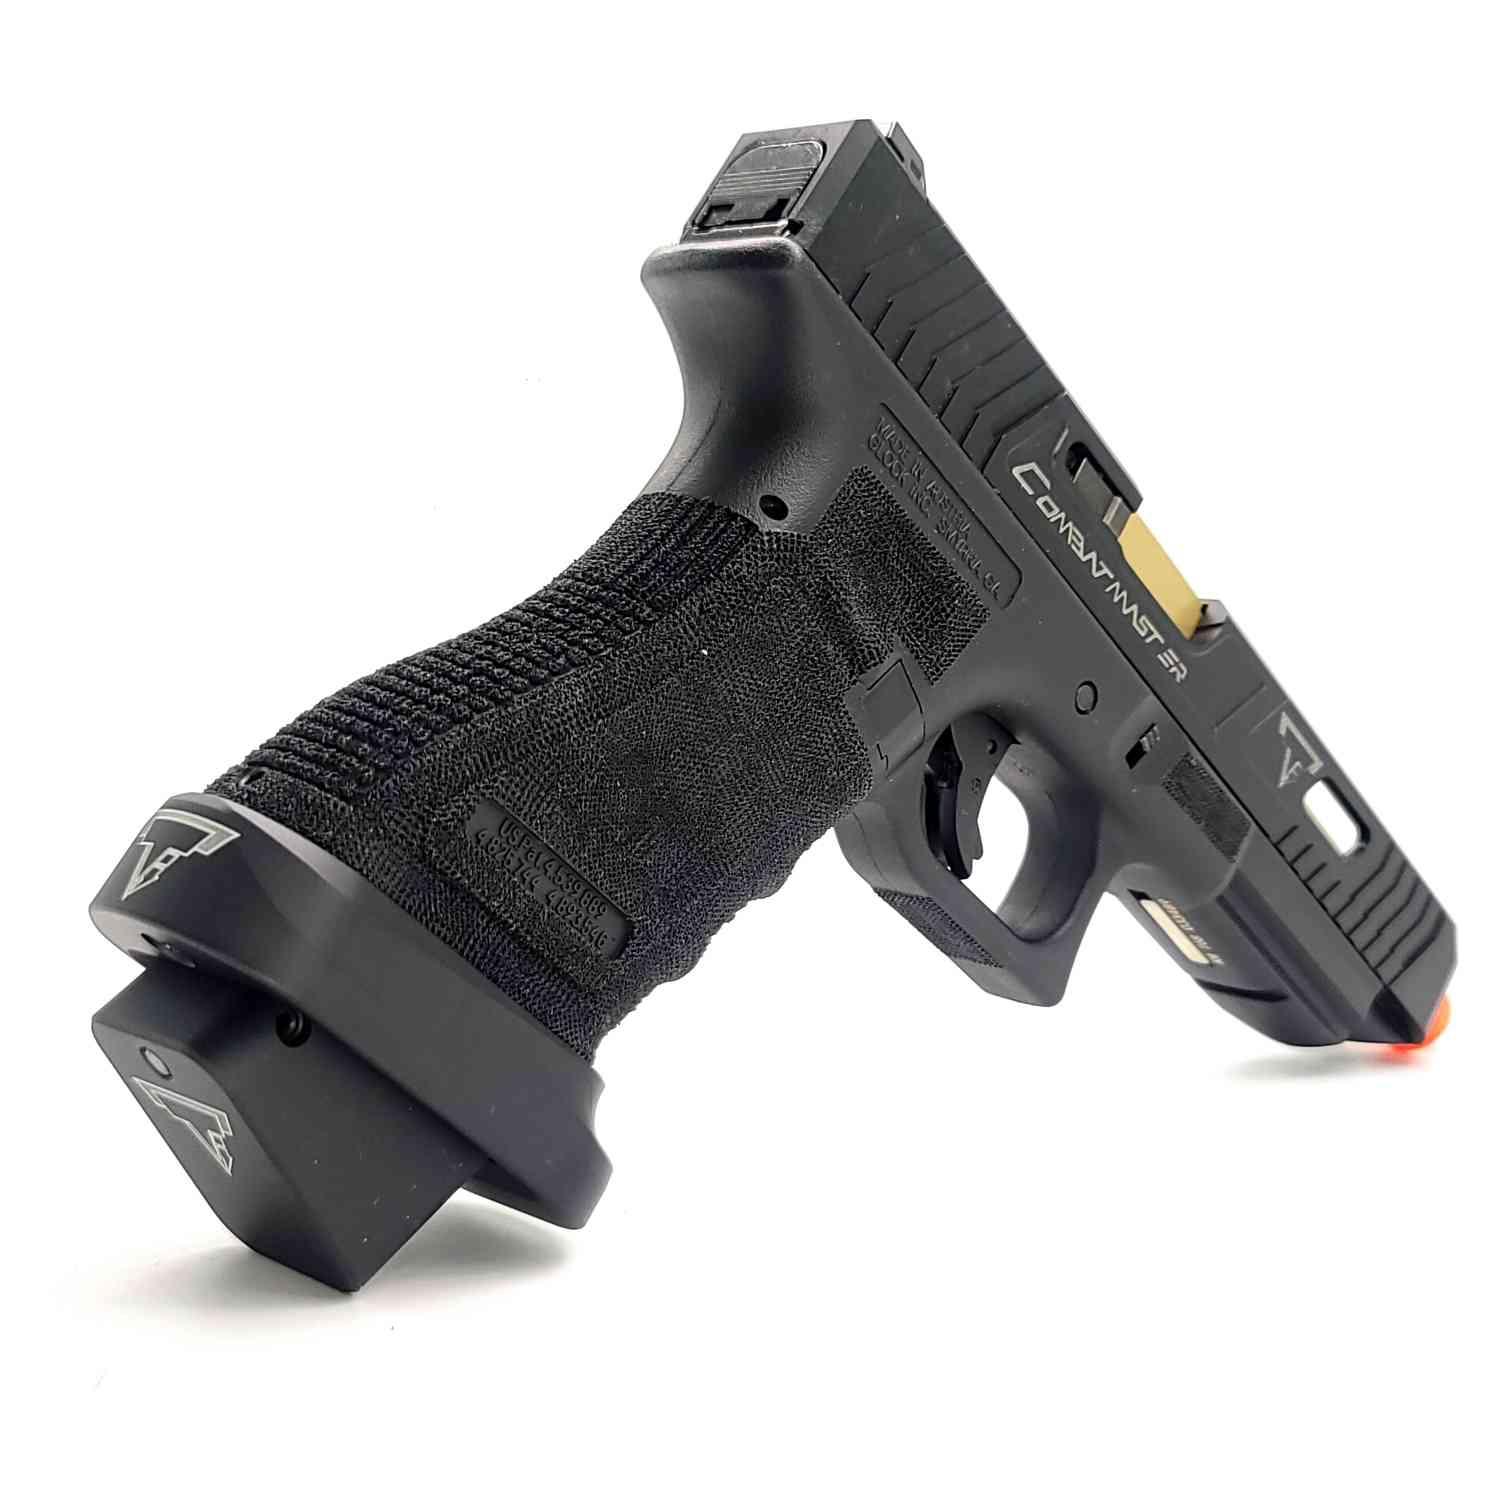 DOUBLE BELL Glock G34 TTI John Wick 2 Combat Master Renegade Blasters